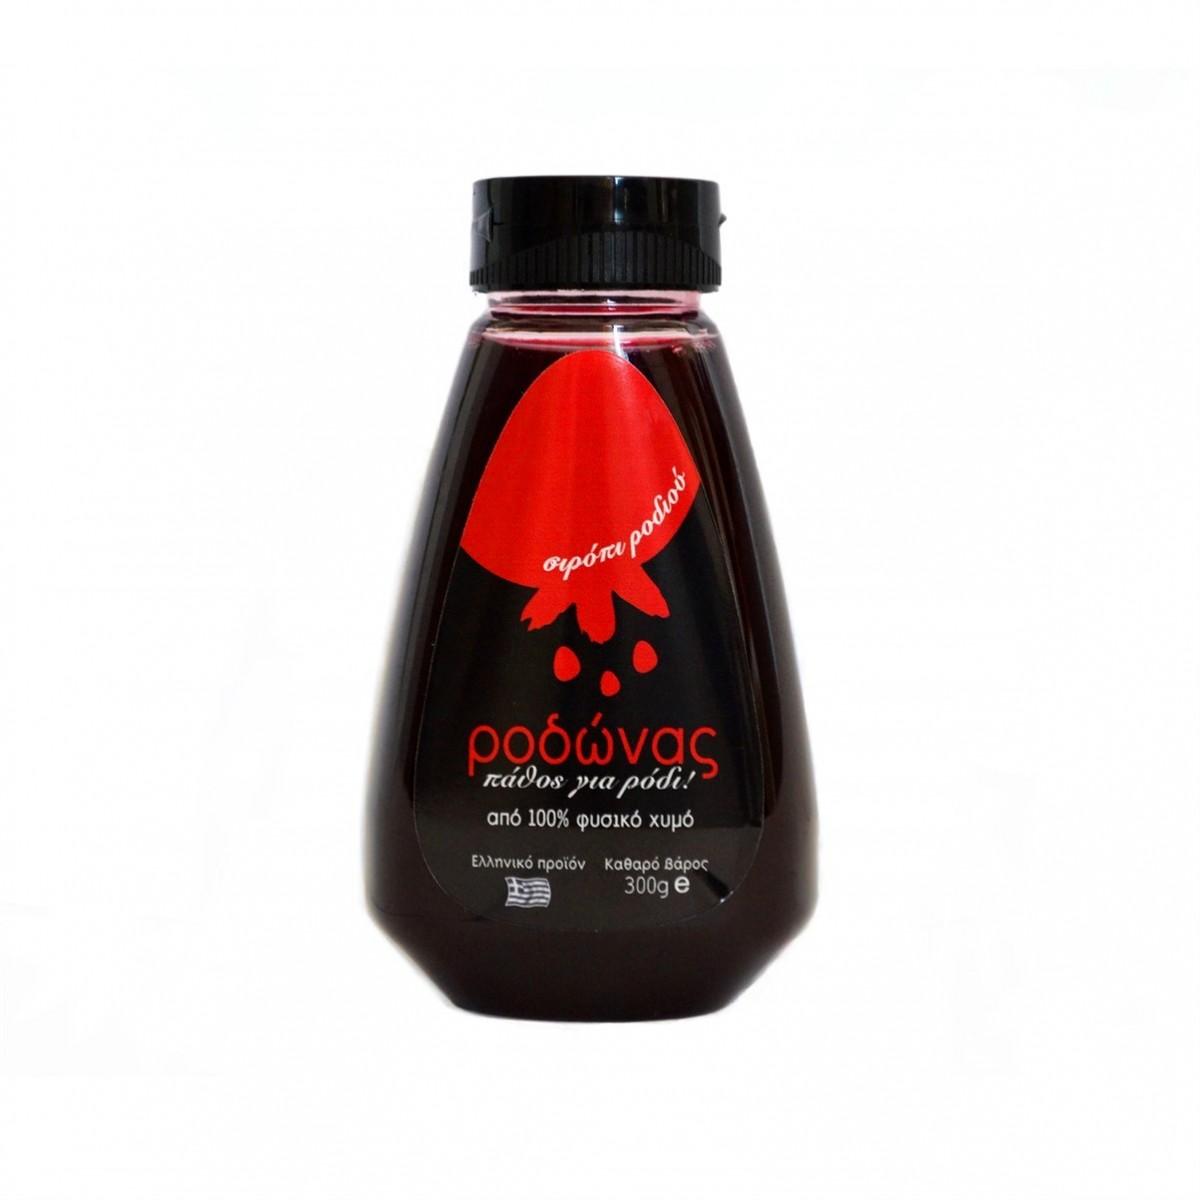 pomegranate siryp 1202x1202